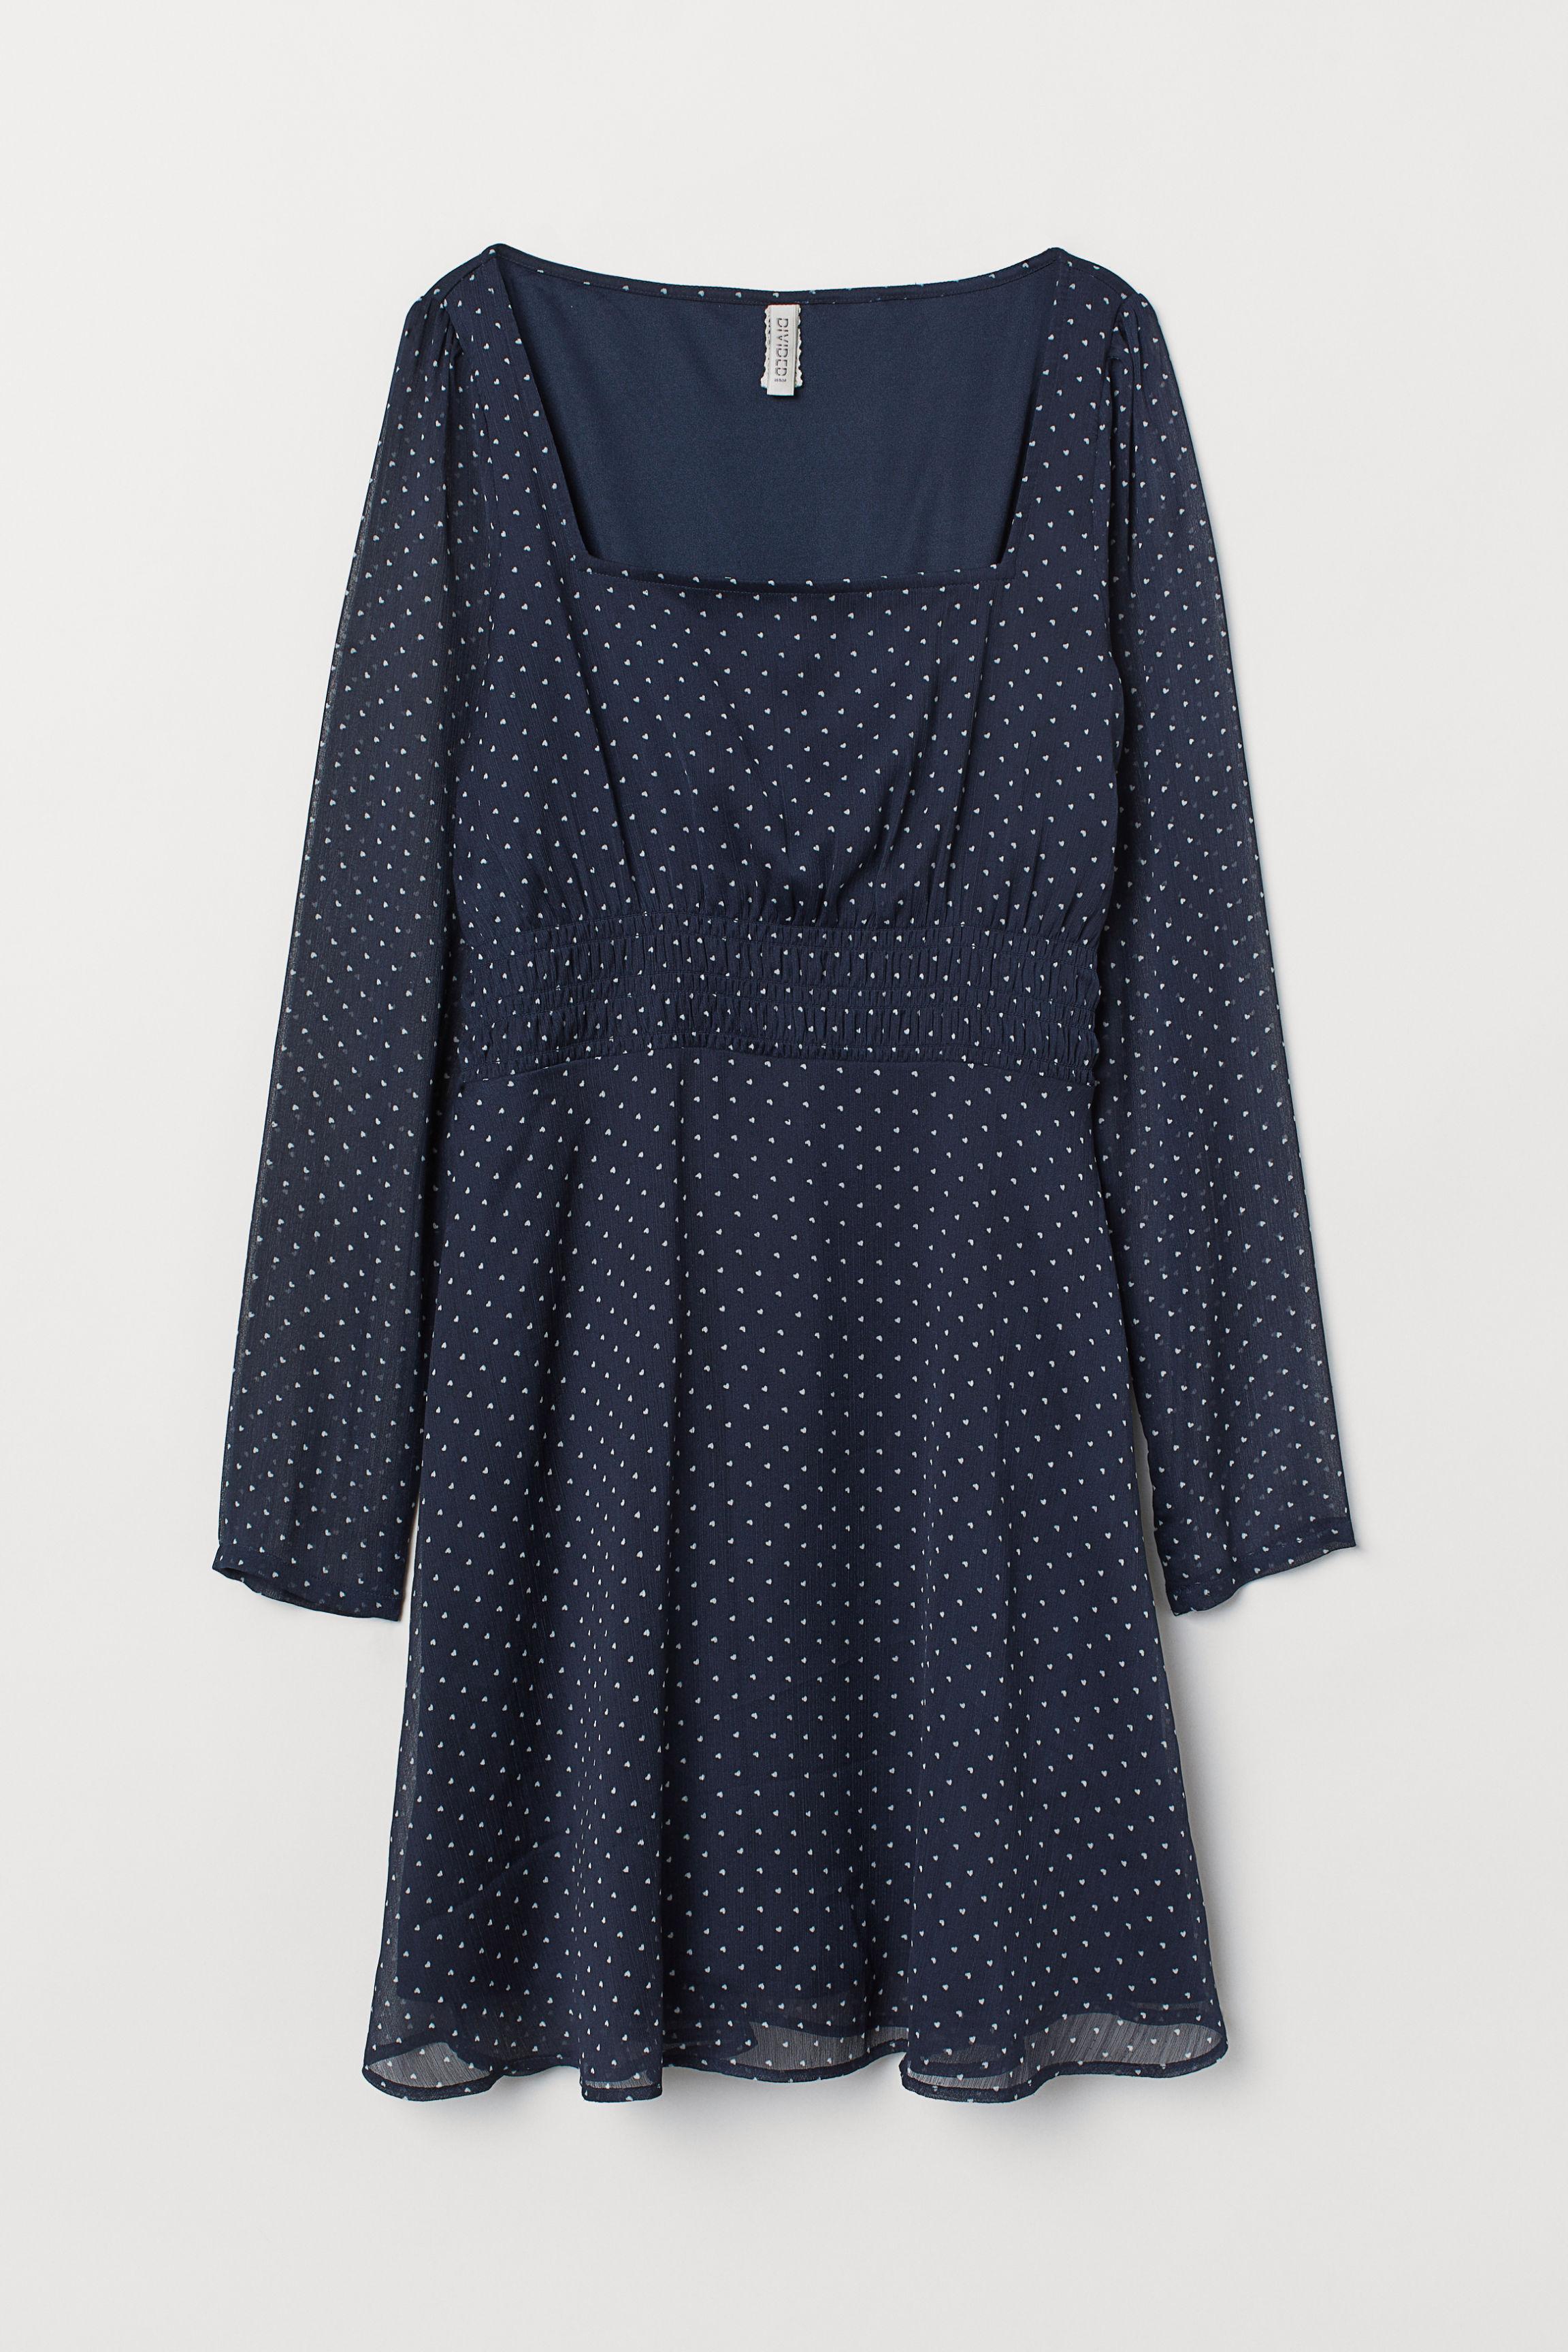 95a33c061637 Patterned Dress - Dark blue/hearts - | H&M US